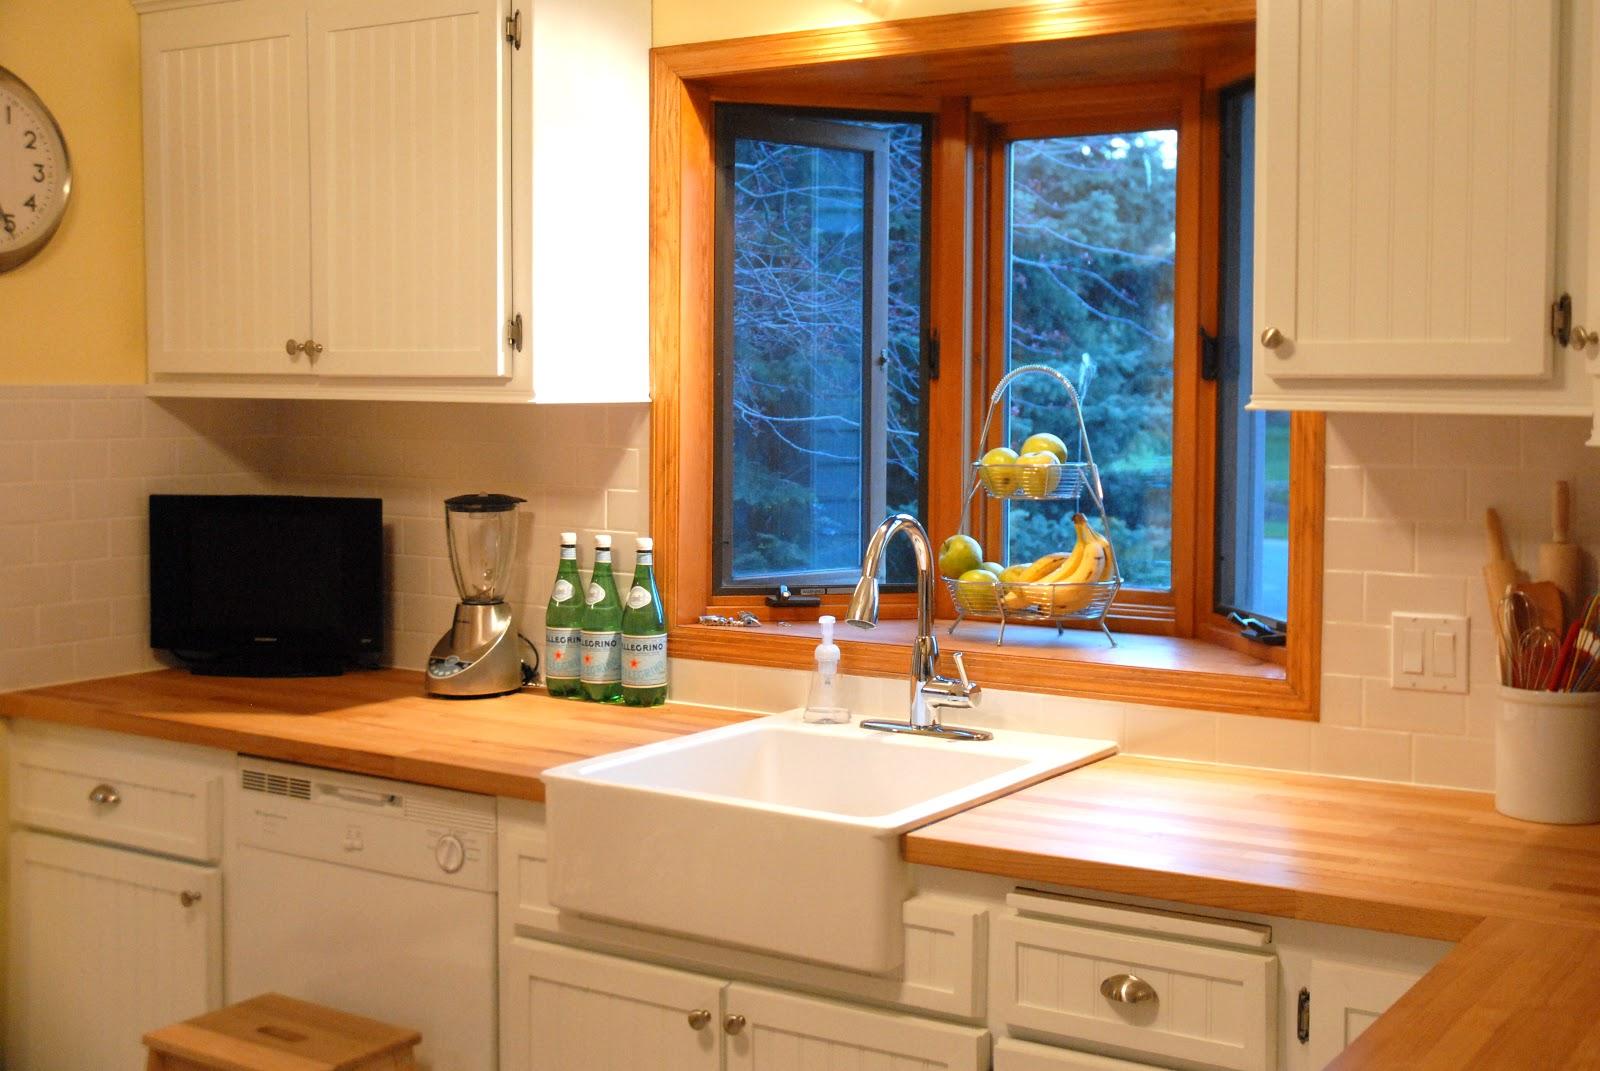 Good Backsplash Ideas For Butcher Block Countertops Part - 11: ... Remodelaholic | House Envy Kitchen Remodel Reveal! On Diy Inexpensive Countertop  Ideas, Butcher Block ...